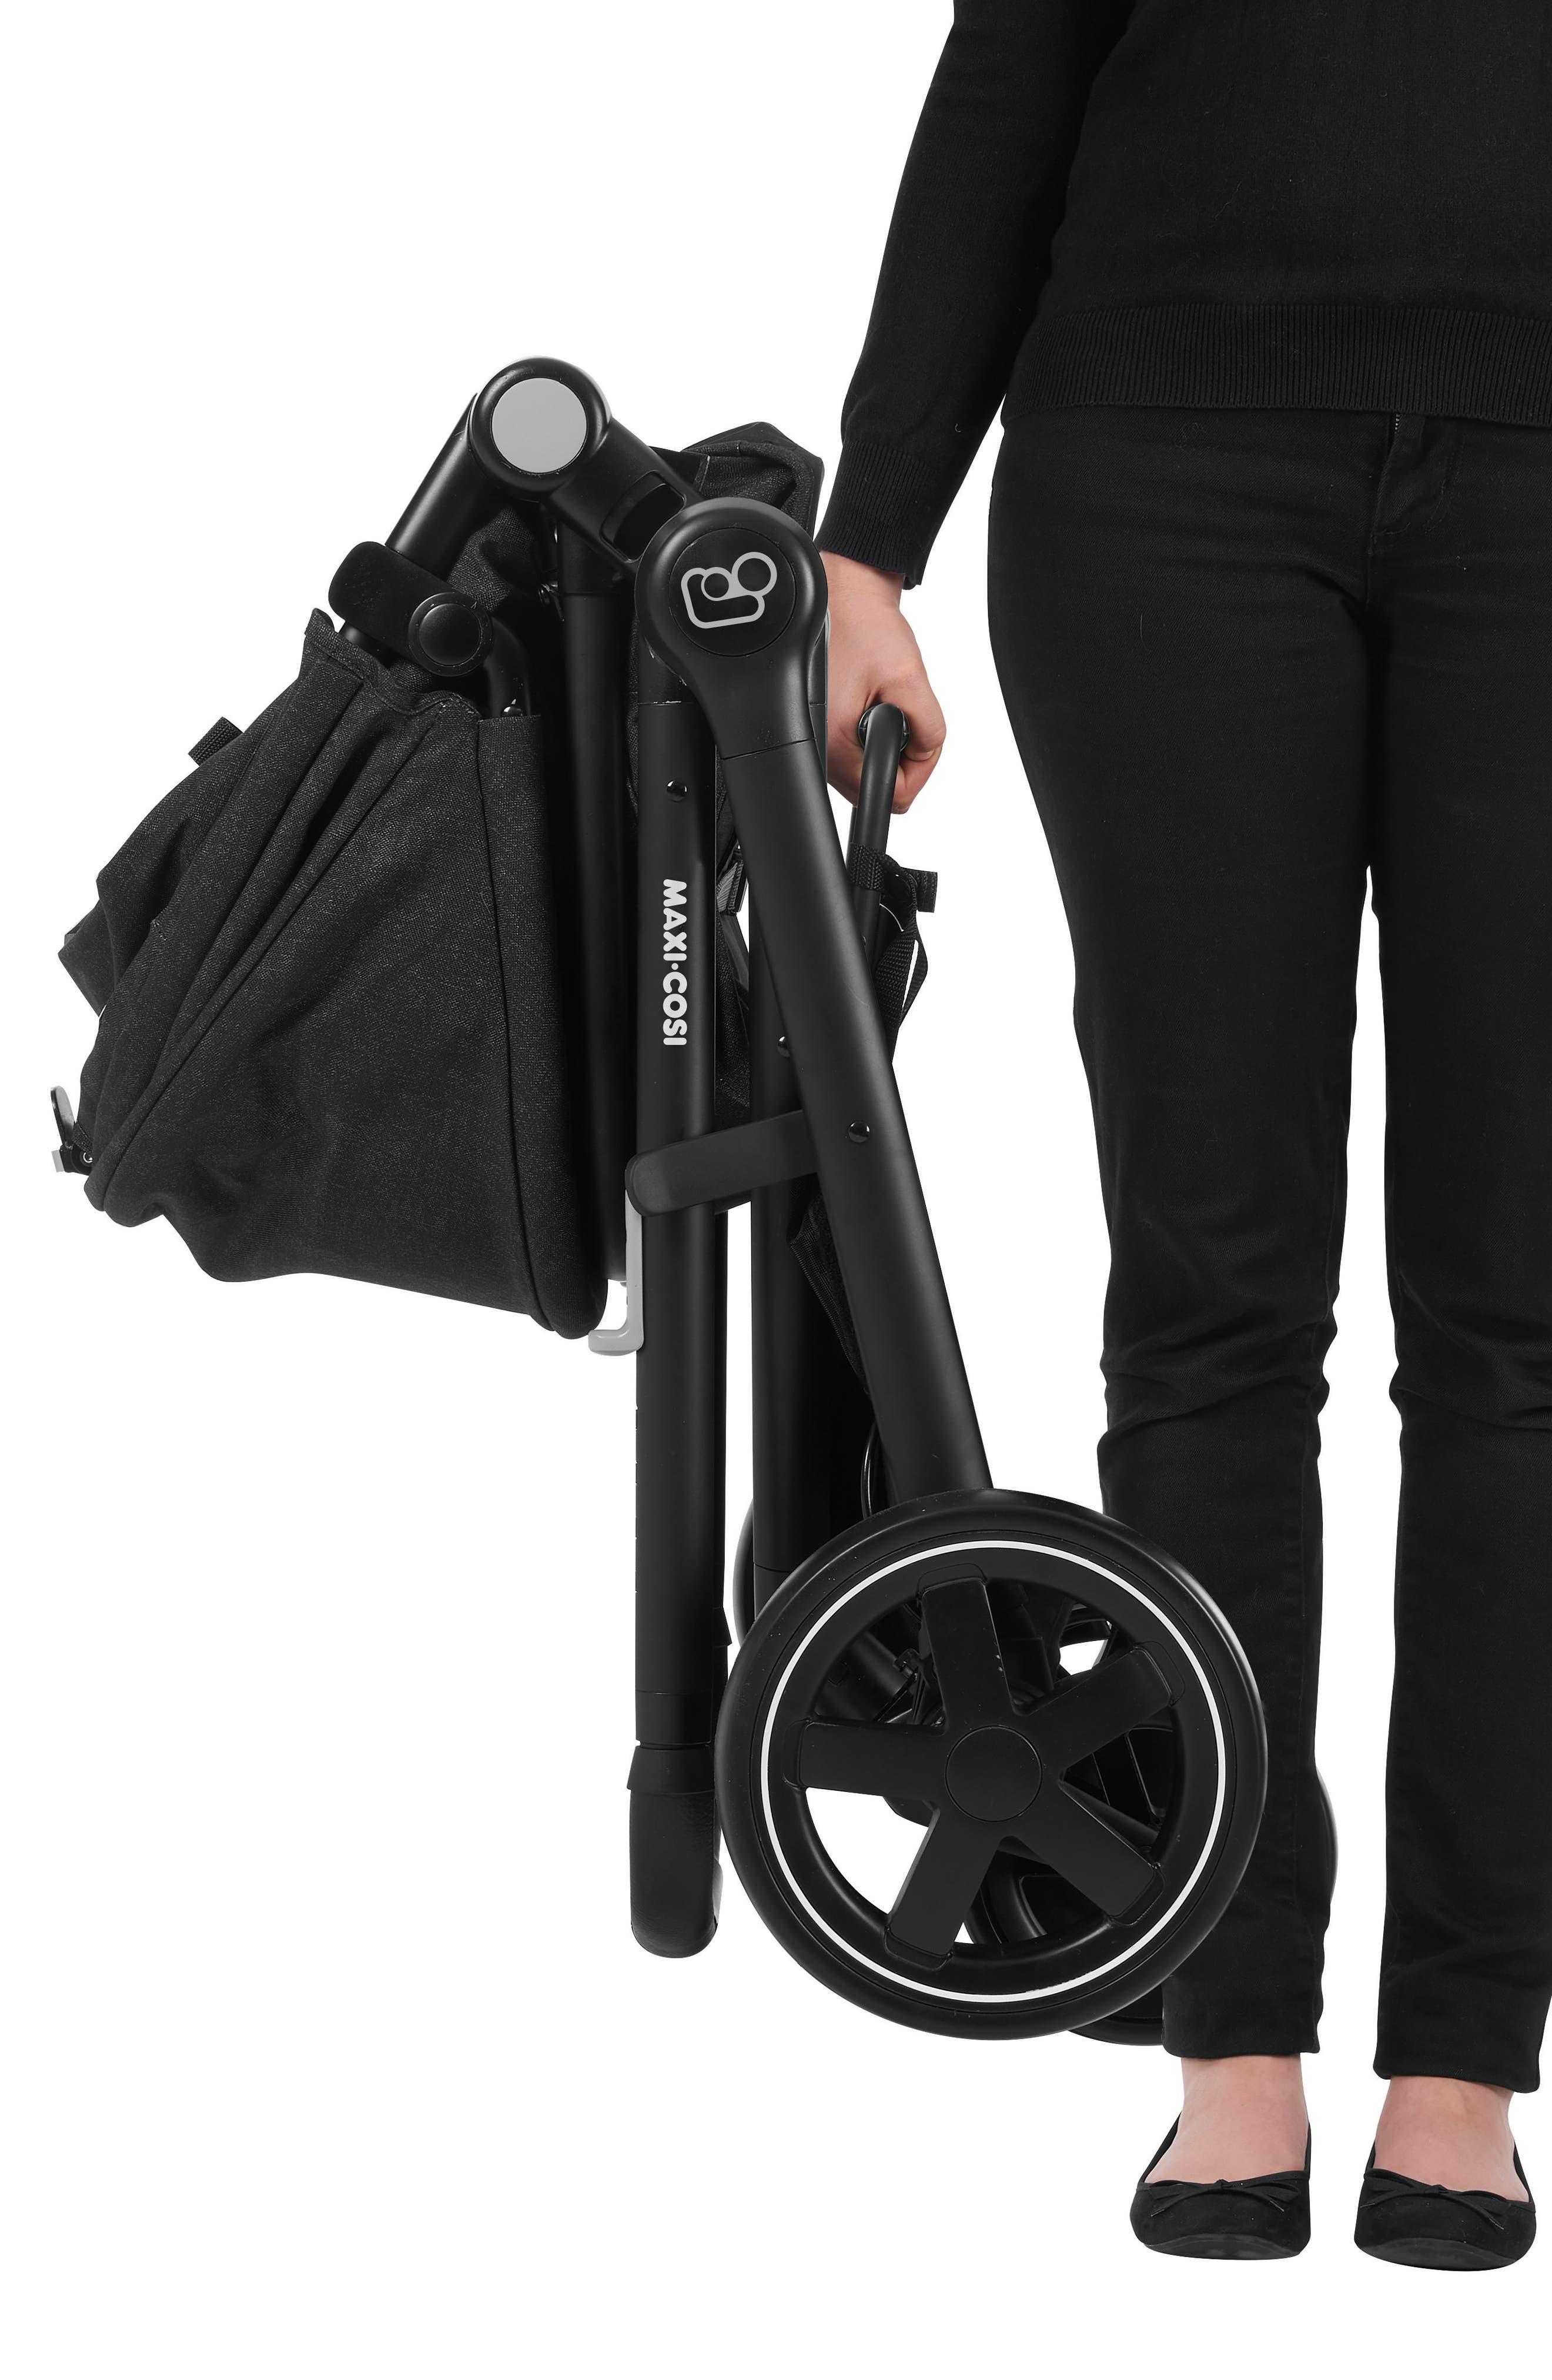 5-1 Mico 30 Infant Car Seat & Zelia Stroller Modular Travel System,                             Alternate thumbnail 12, color,                             NIGHT BLACK